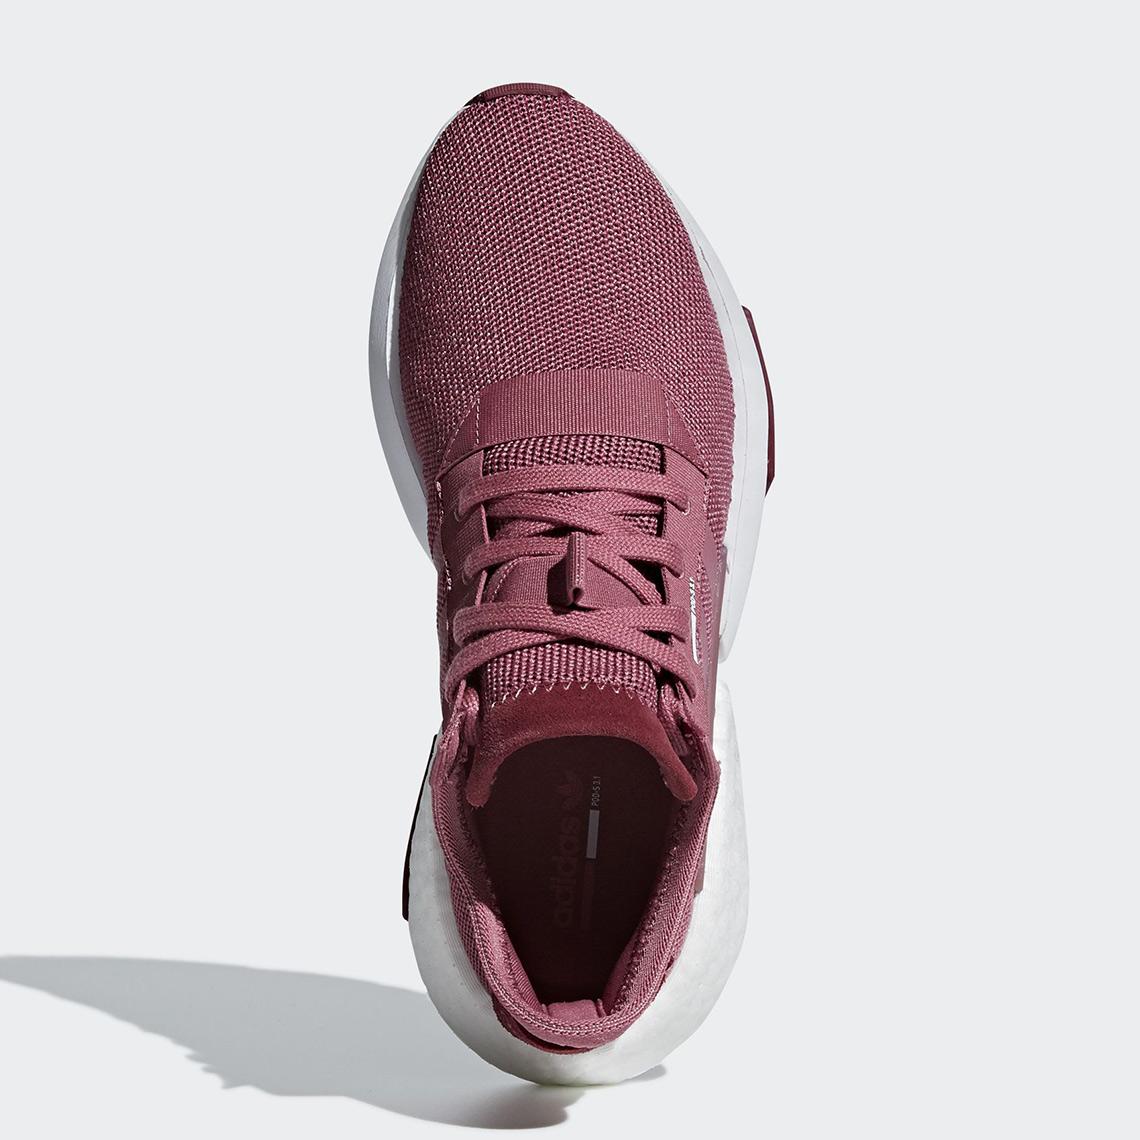 adidas pod b37508 3 - adidas POD B37508 Release Info + Photos